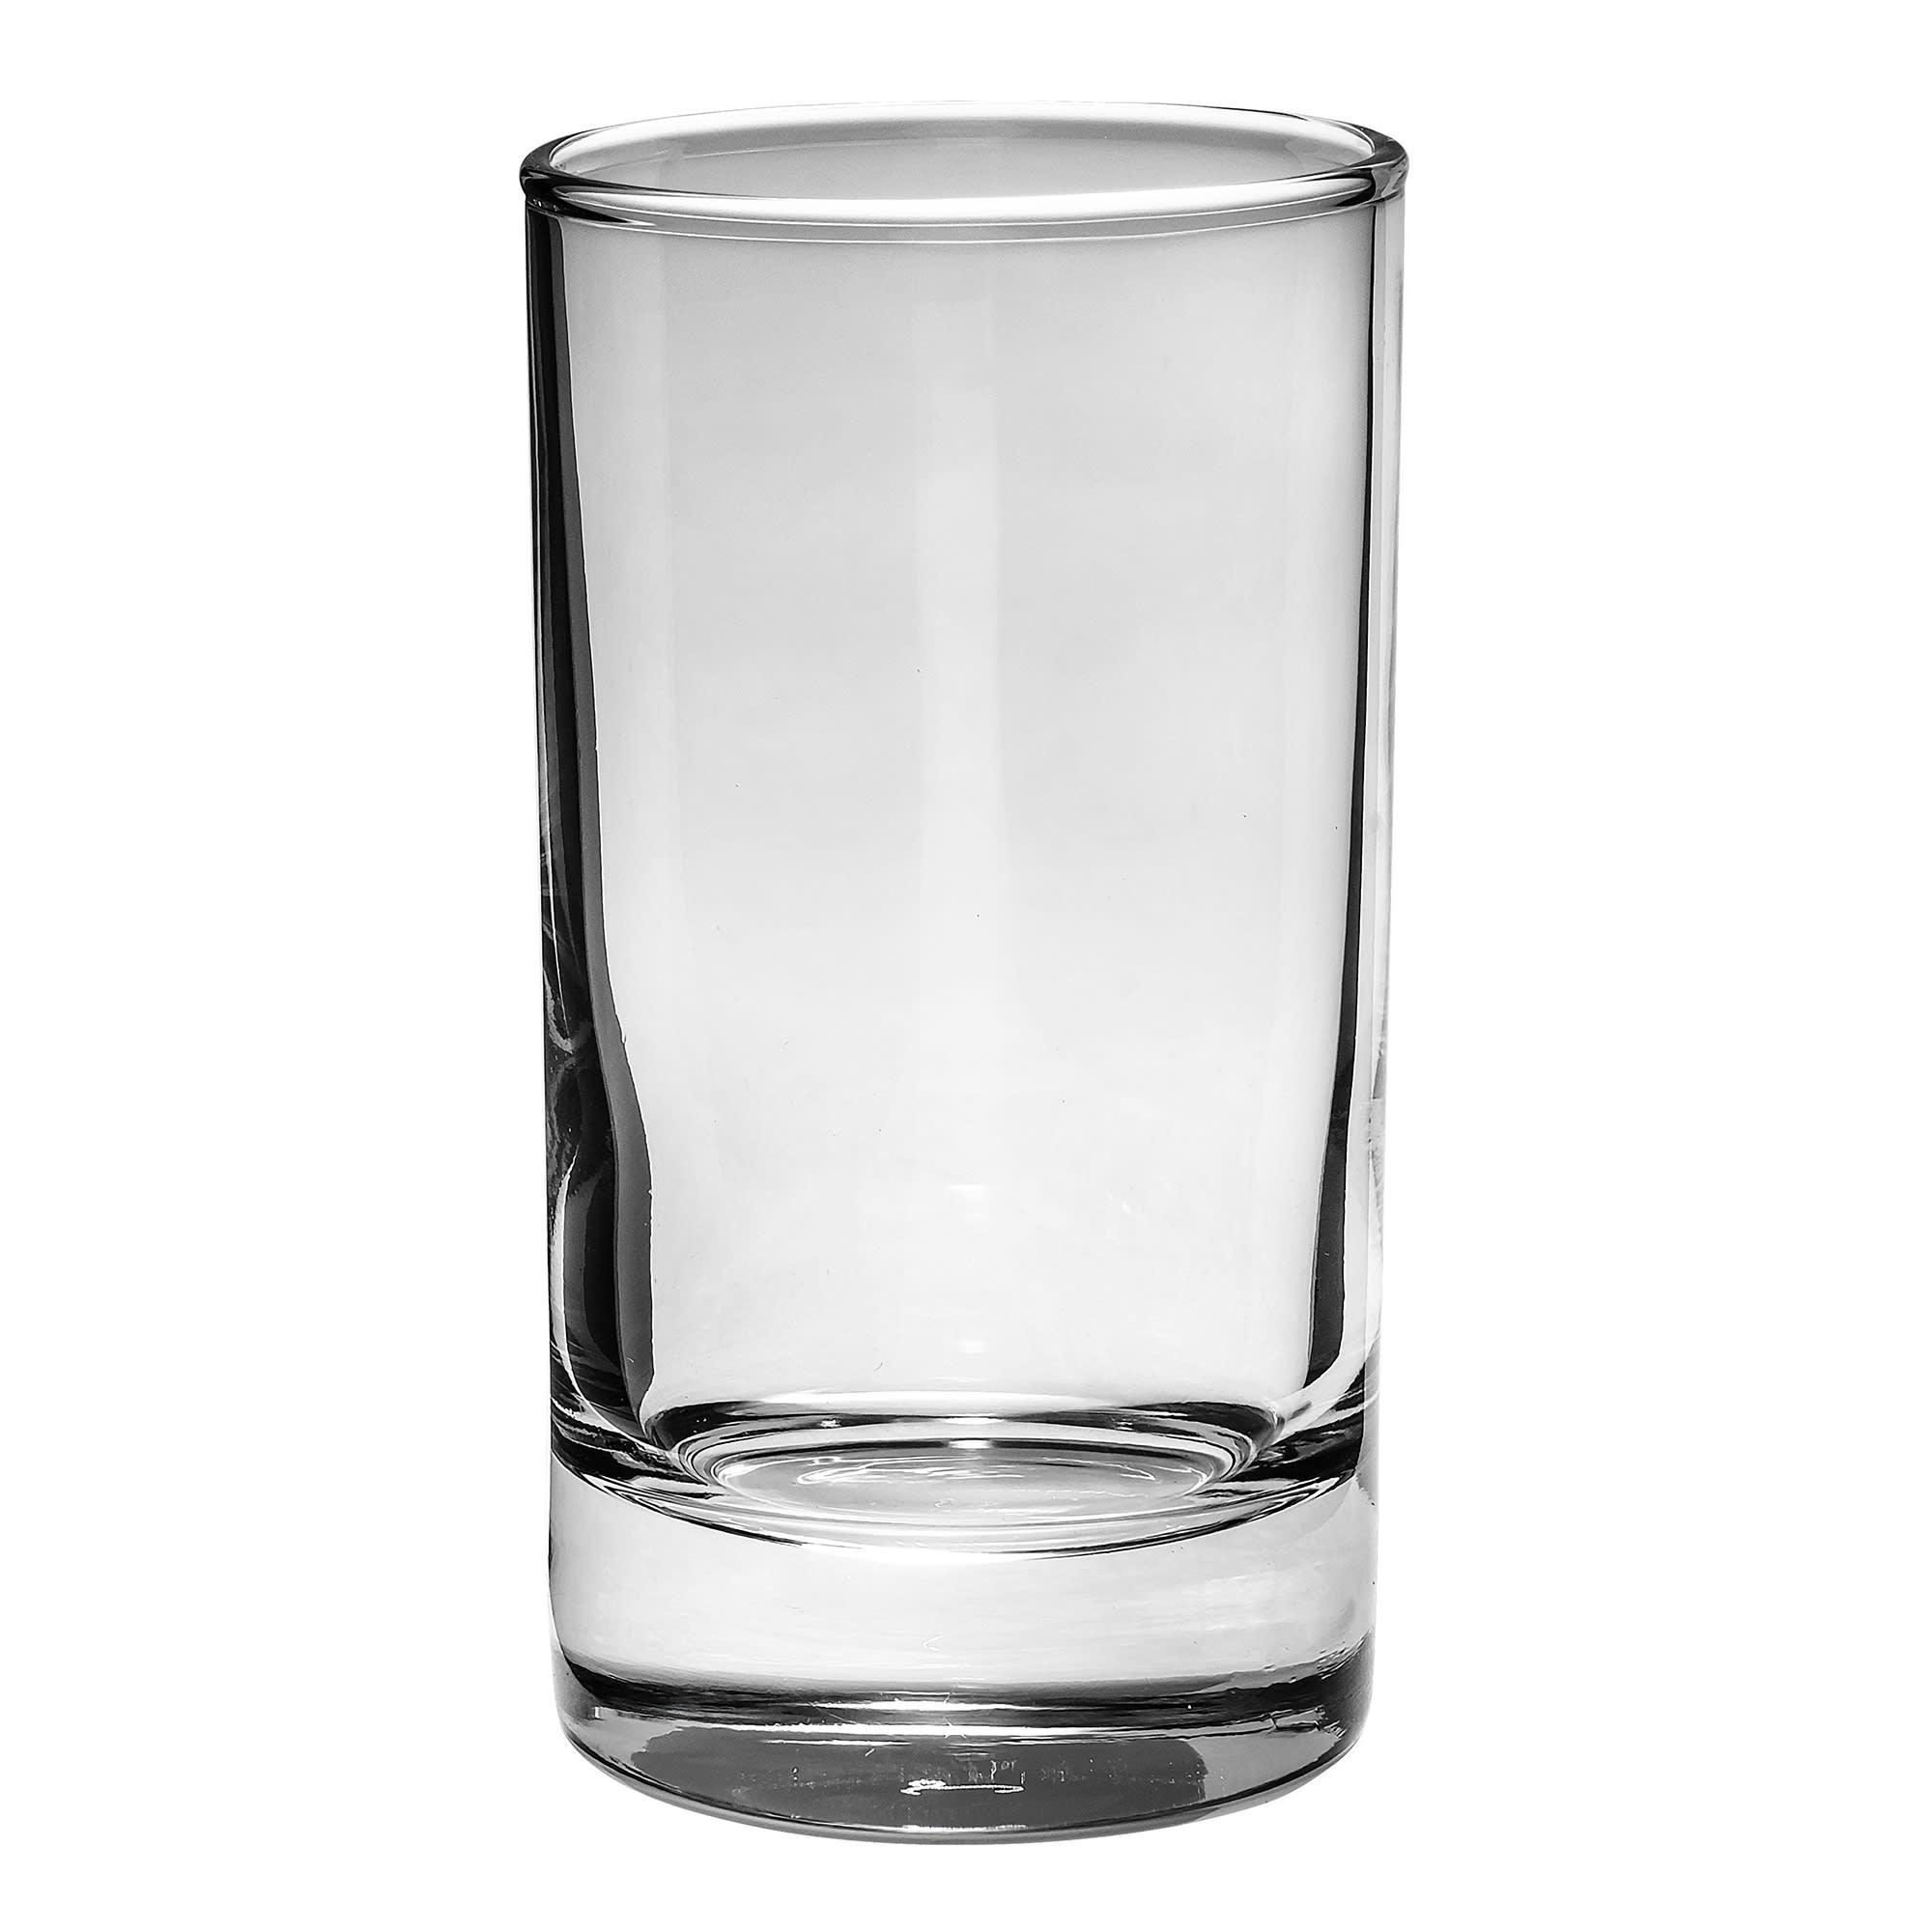 Libbey 2523 4.75 oz Chicago Juice Glass - Safedge Rim Guarantee